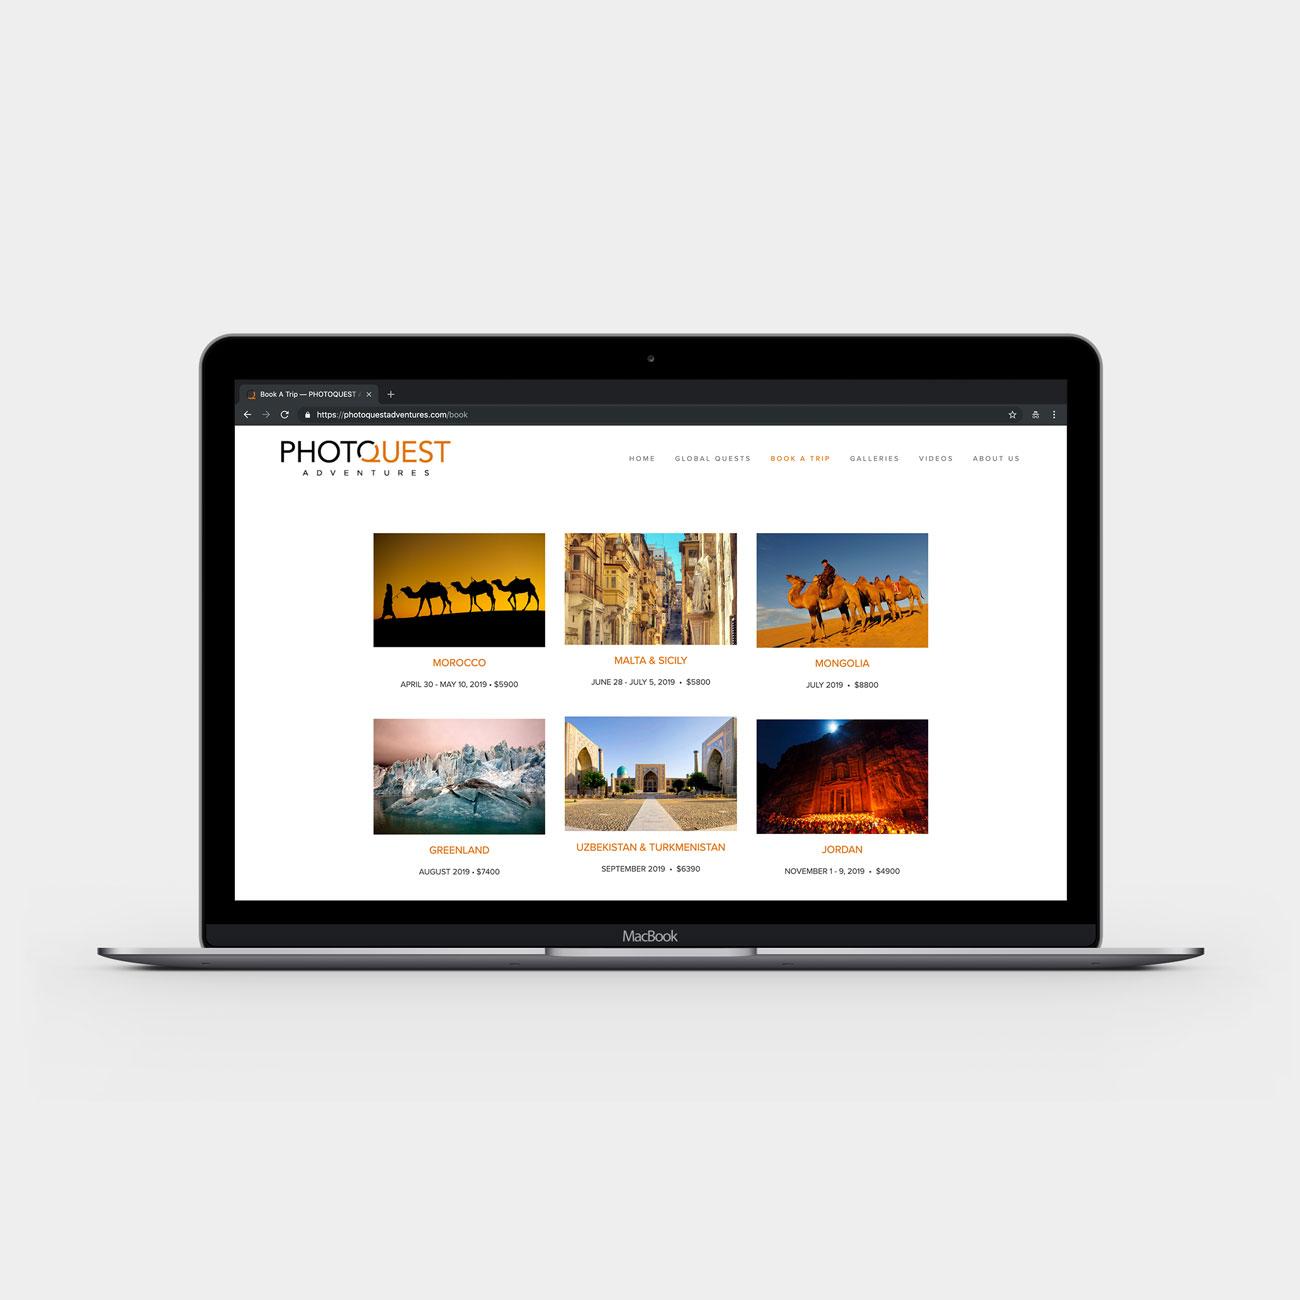 PhotoQuest website on laptop